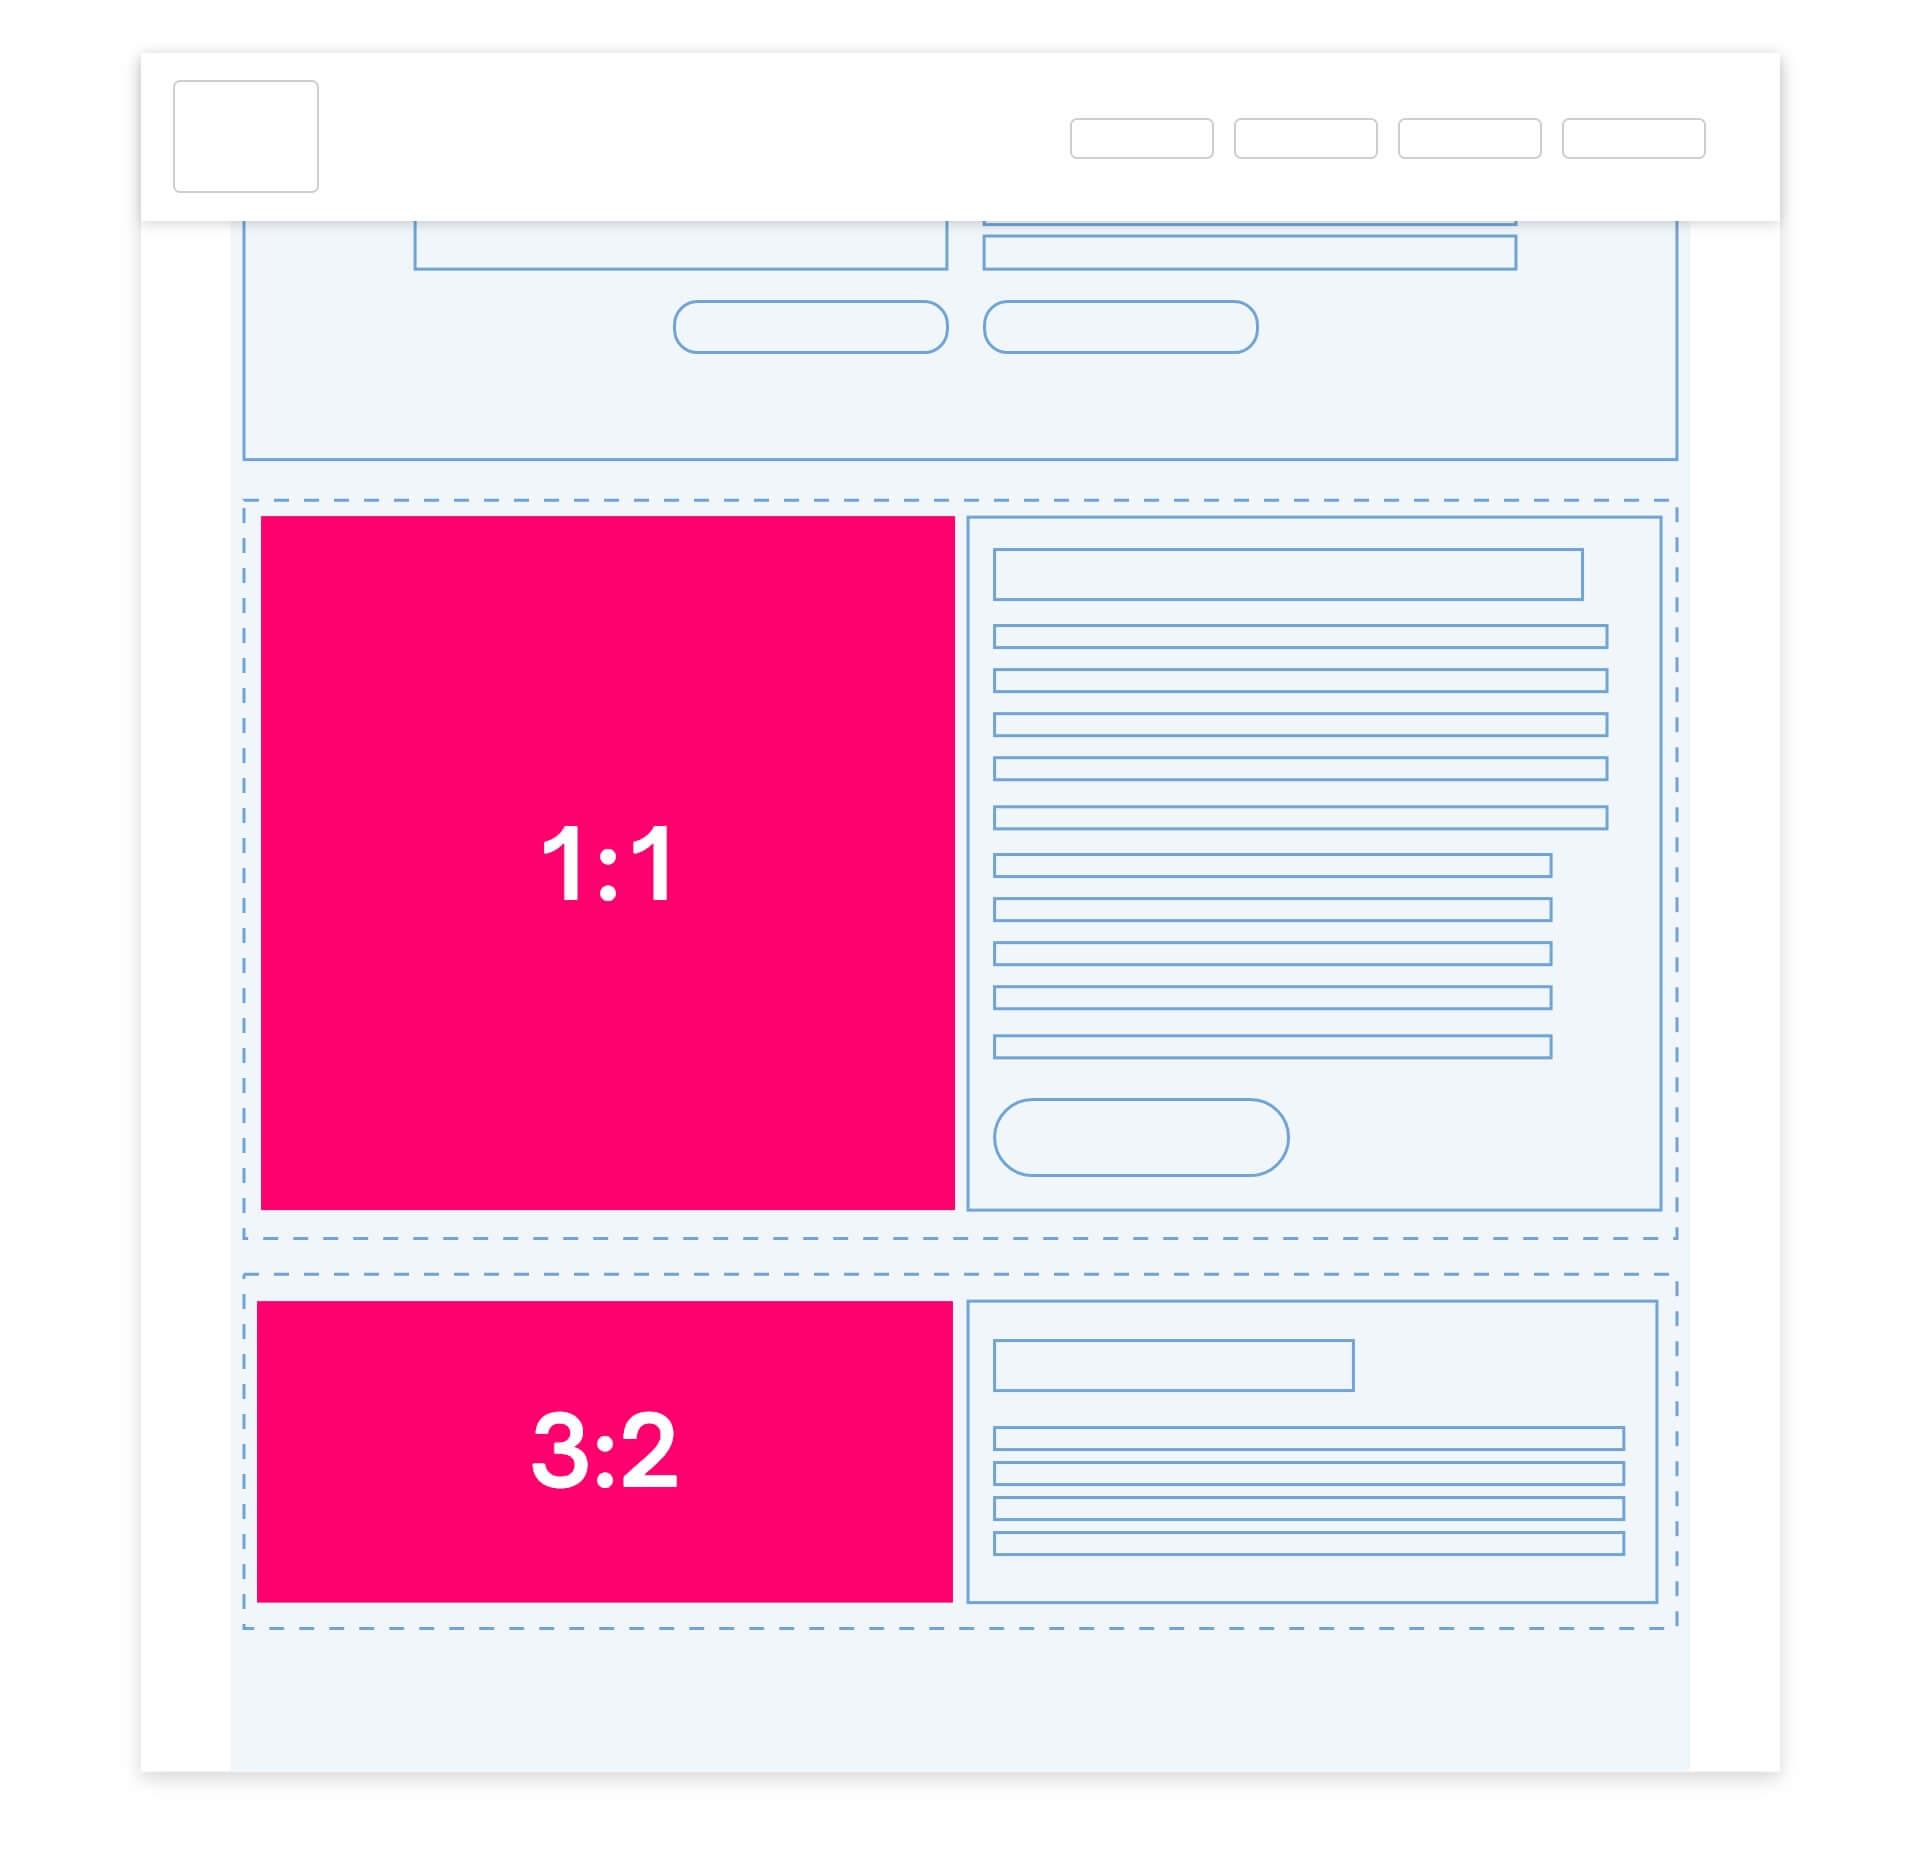 Half-width image options on websites